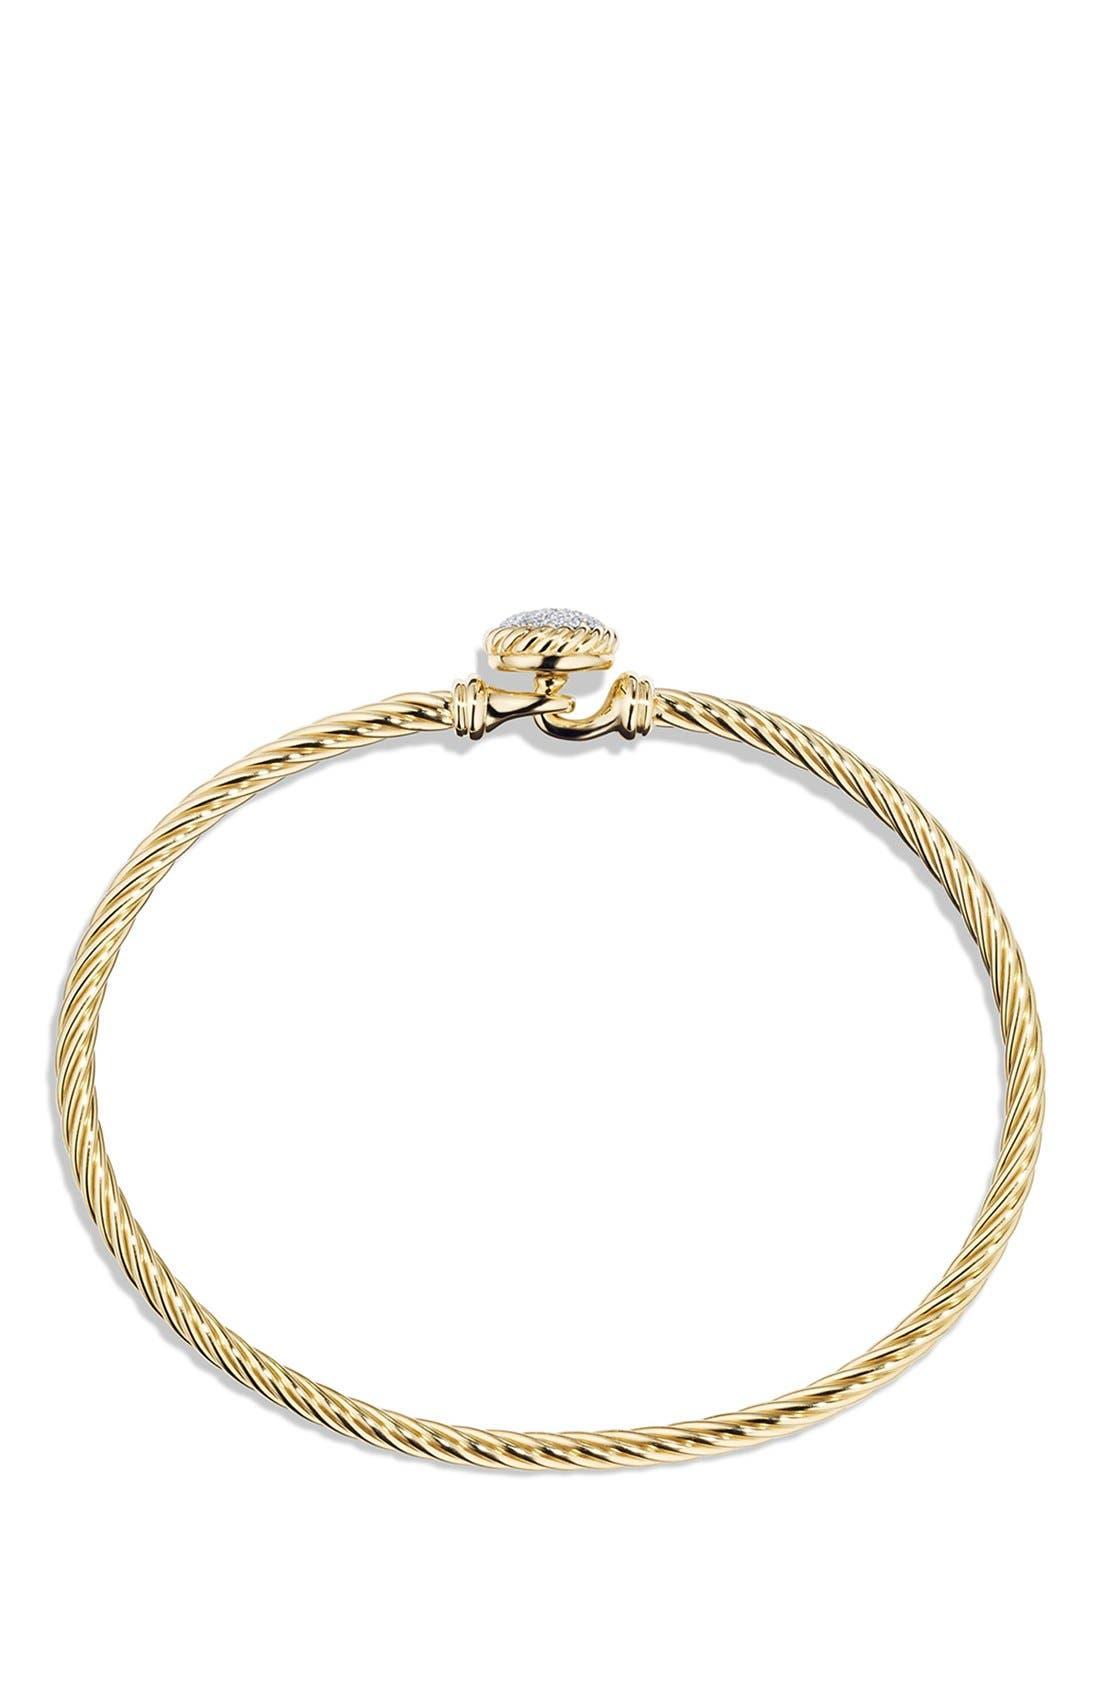 Alternate Image 2  - David Yurman 'Châtelaine' Bracelet with Diamonds in 18K Gold